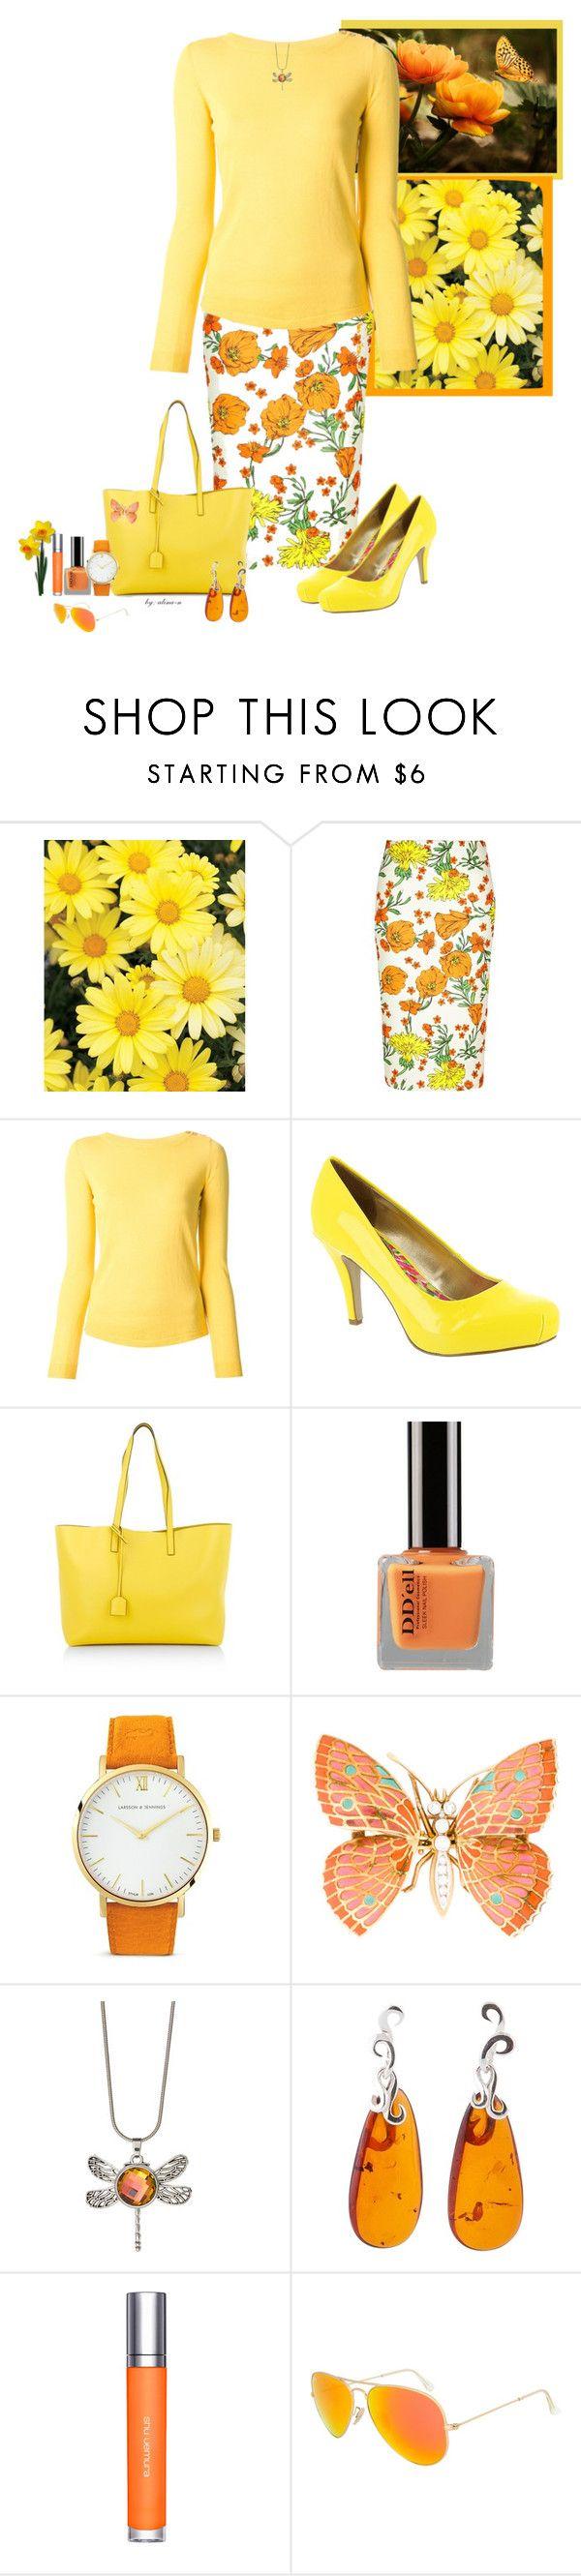 Takashi murakami sun flowers and contemporary art uniqlog -  Yellow Orange By Alina N Liked On Polyvore Featuring Zanone